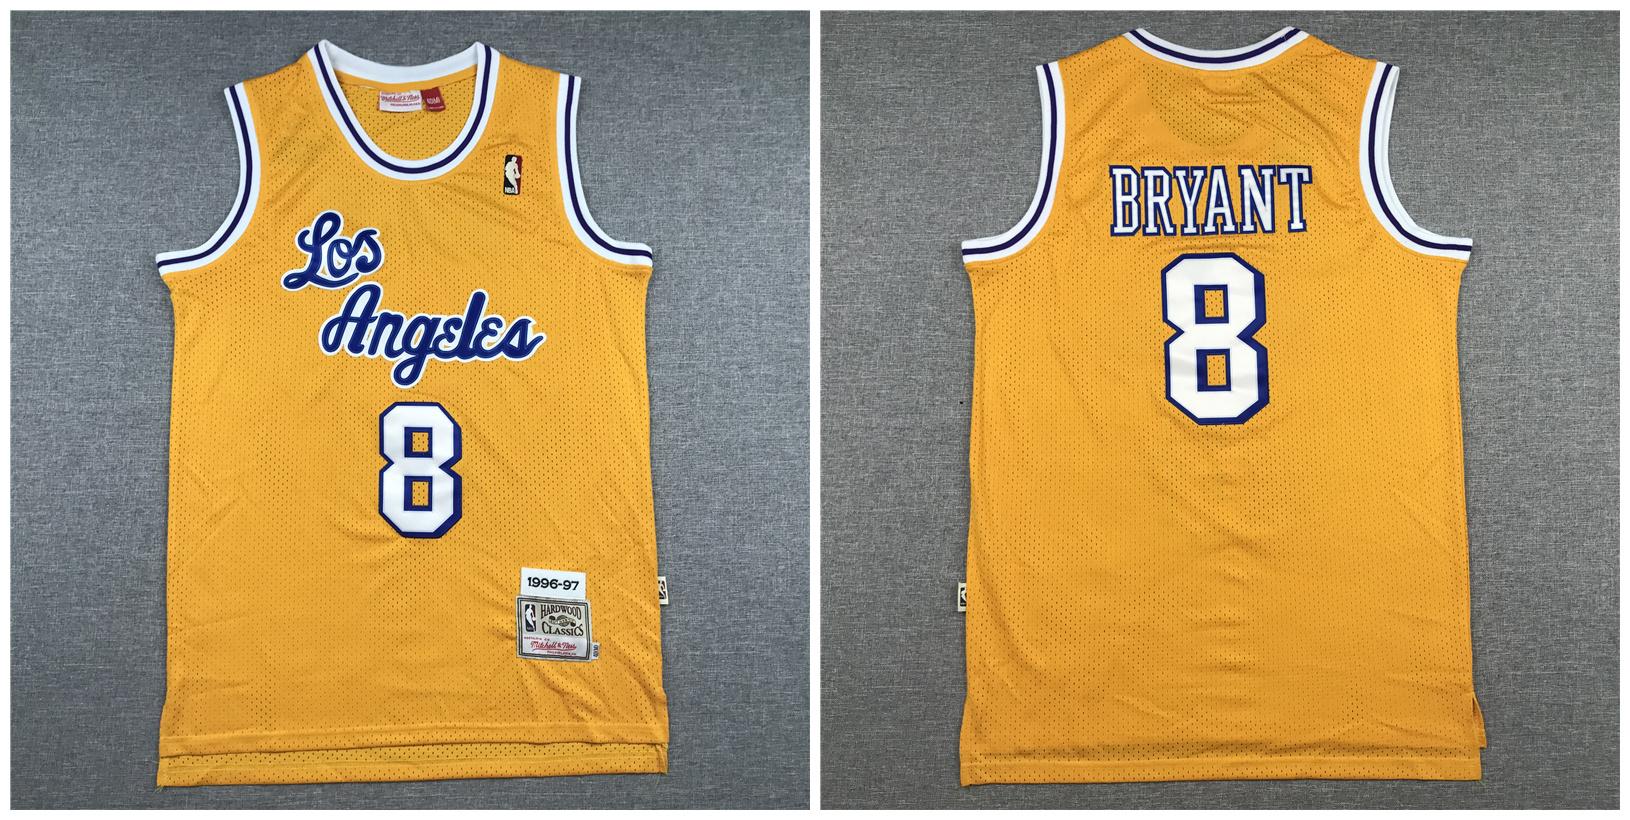 Lakers 8 Kobe Bryant Yellow 1996-97 Hardwood Classics Swingman Jersey